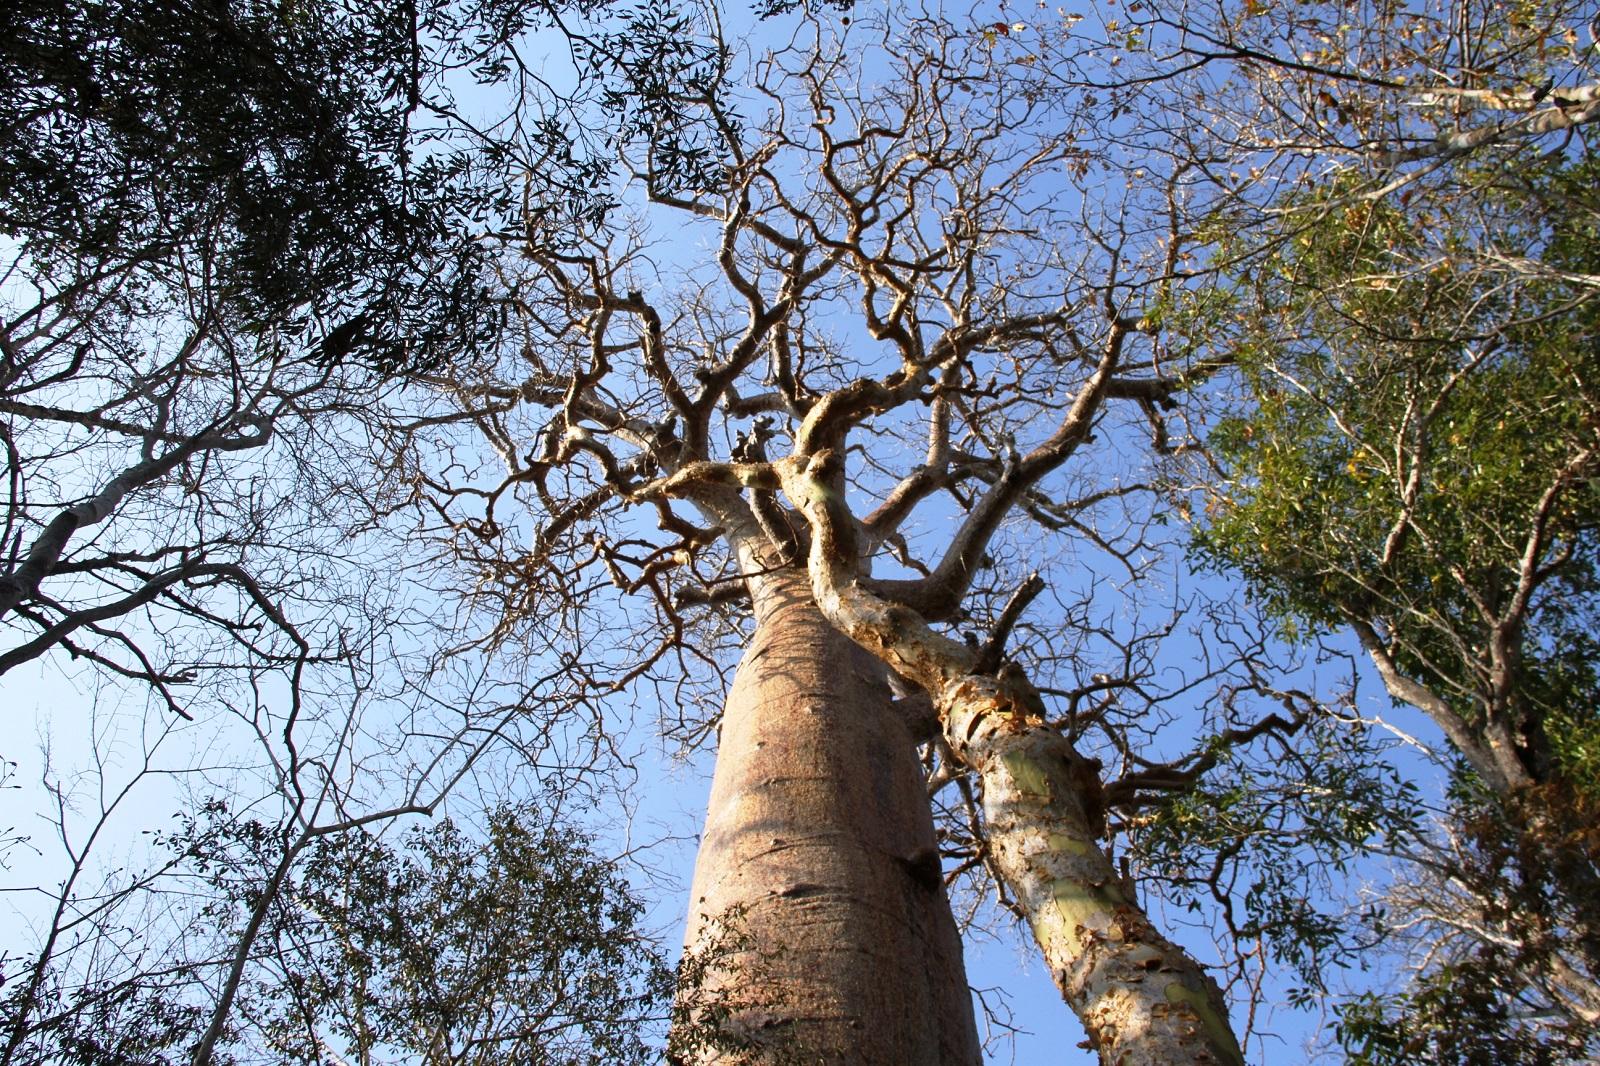 LA RESERVE FORESTIERE DE KIRINDY